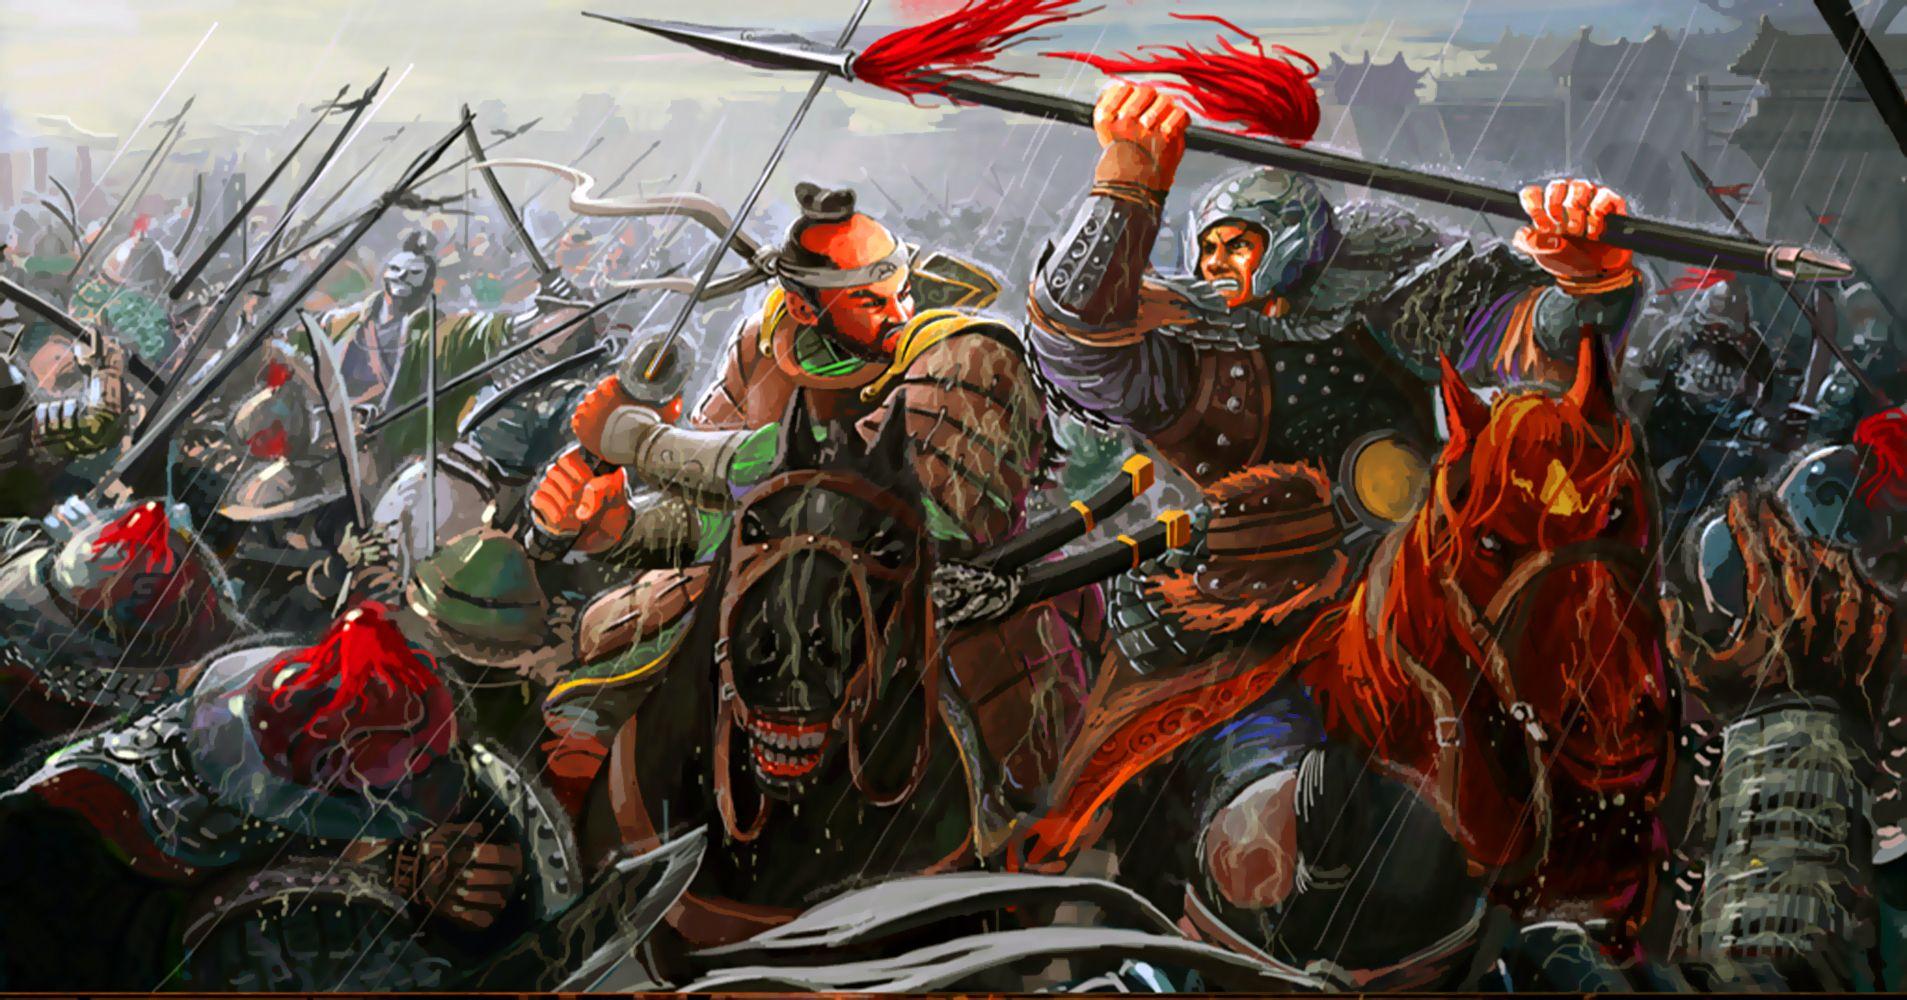 Imjin War between Japan and Korea in 2019 | Ancient china